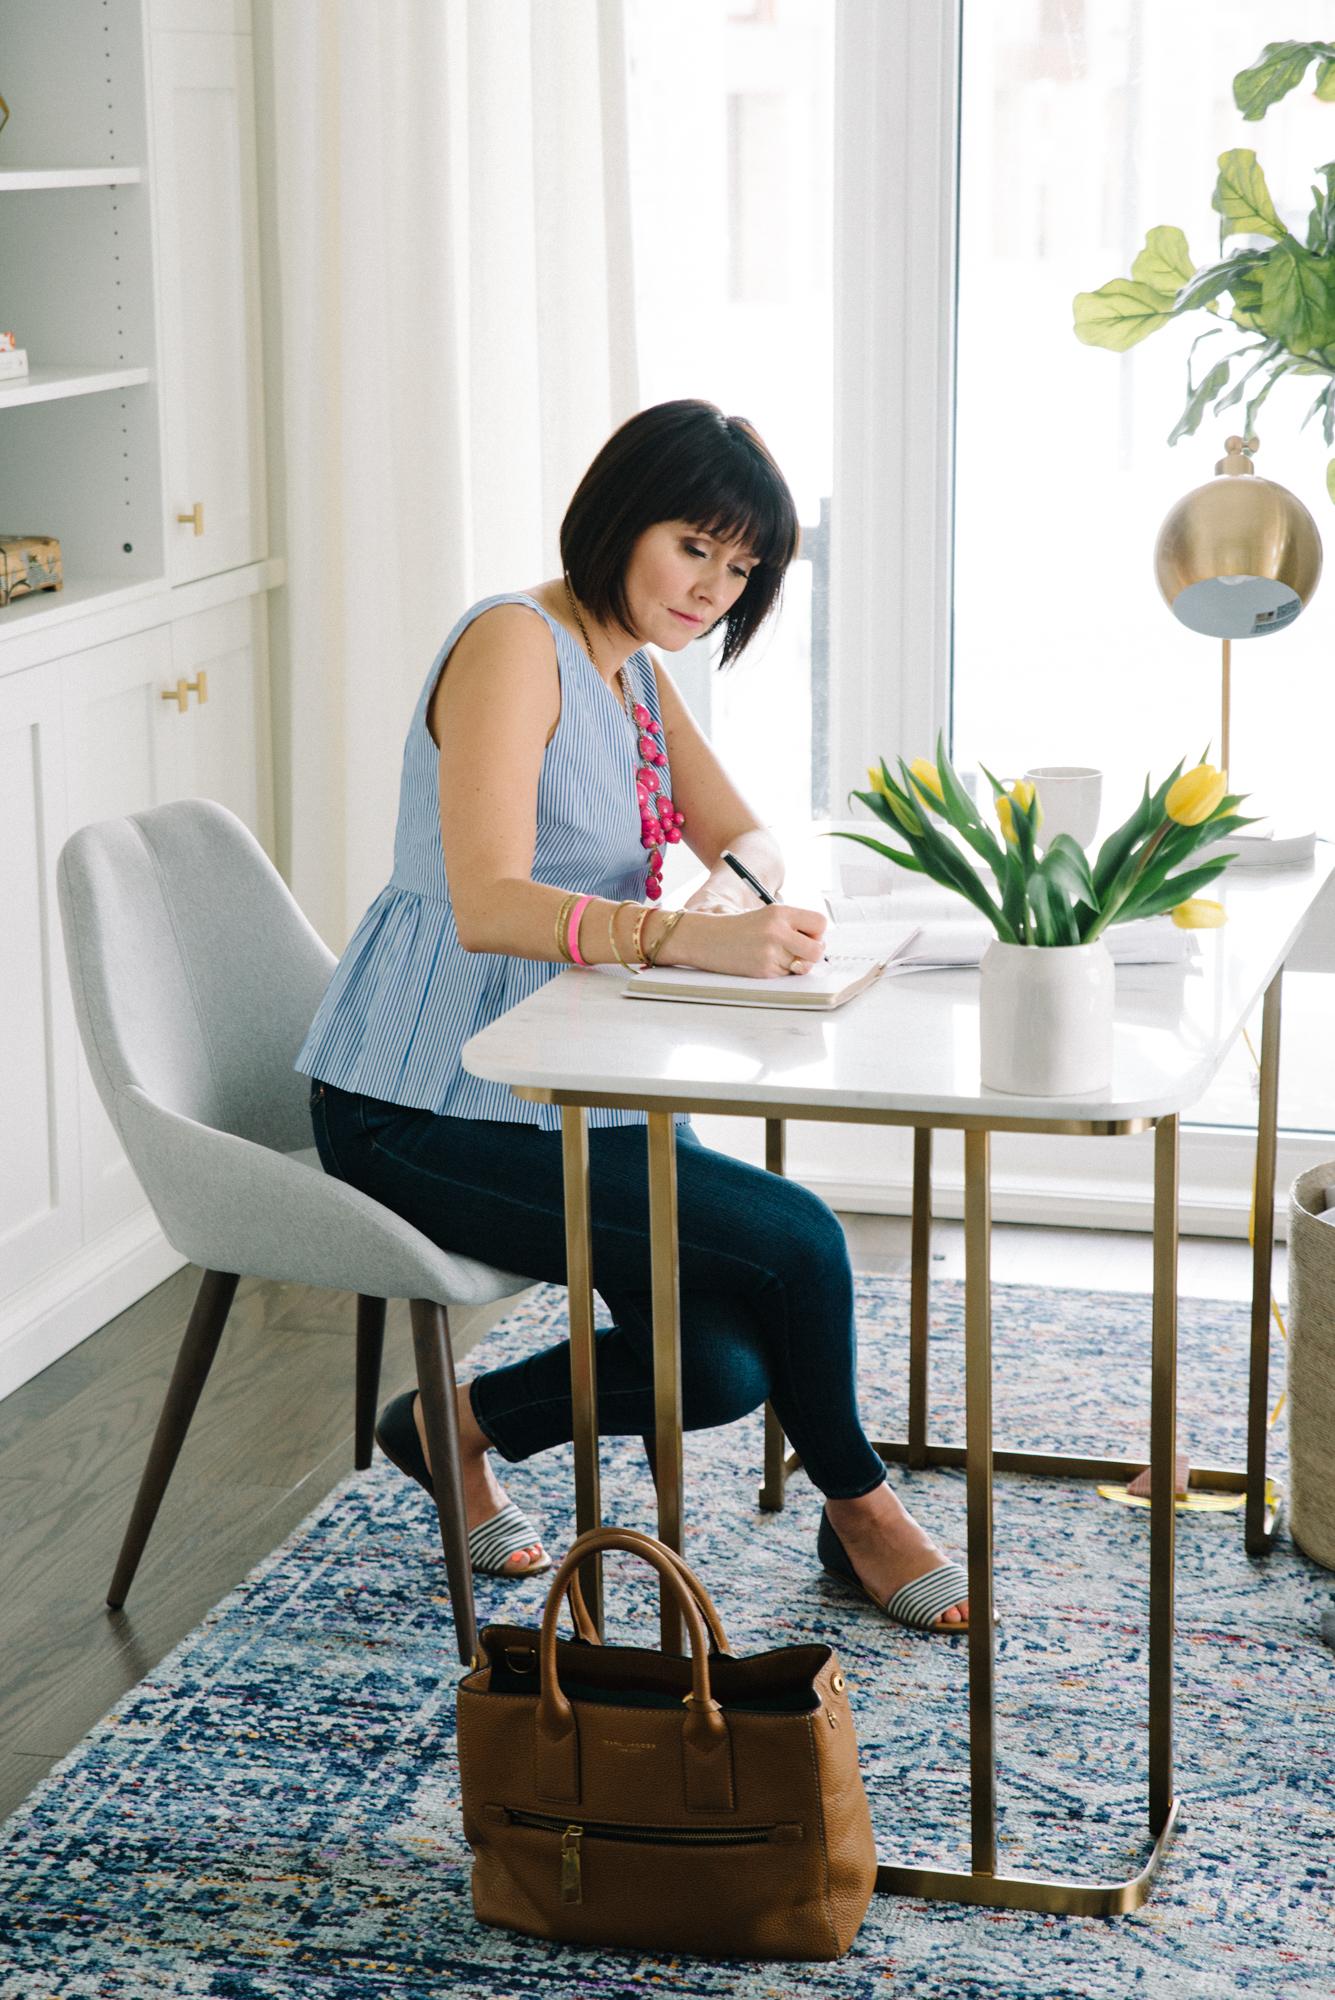 StefEthan-RebeccaHayDesigns-Aurora-InteriorDesigner-InteriorDesign-TorontoPortraitPhotographer-LifestylePhotography-TorontoInteriorDesigner-3.JPG